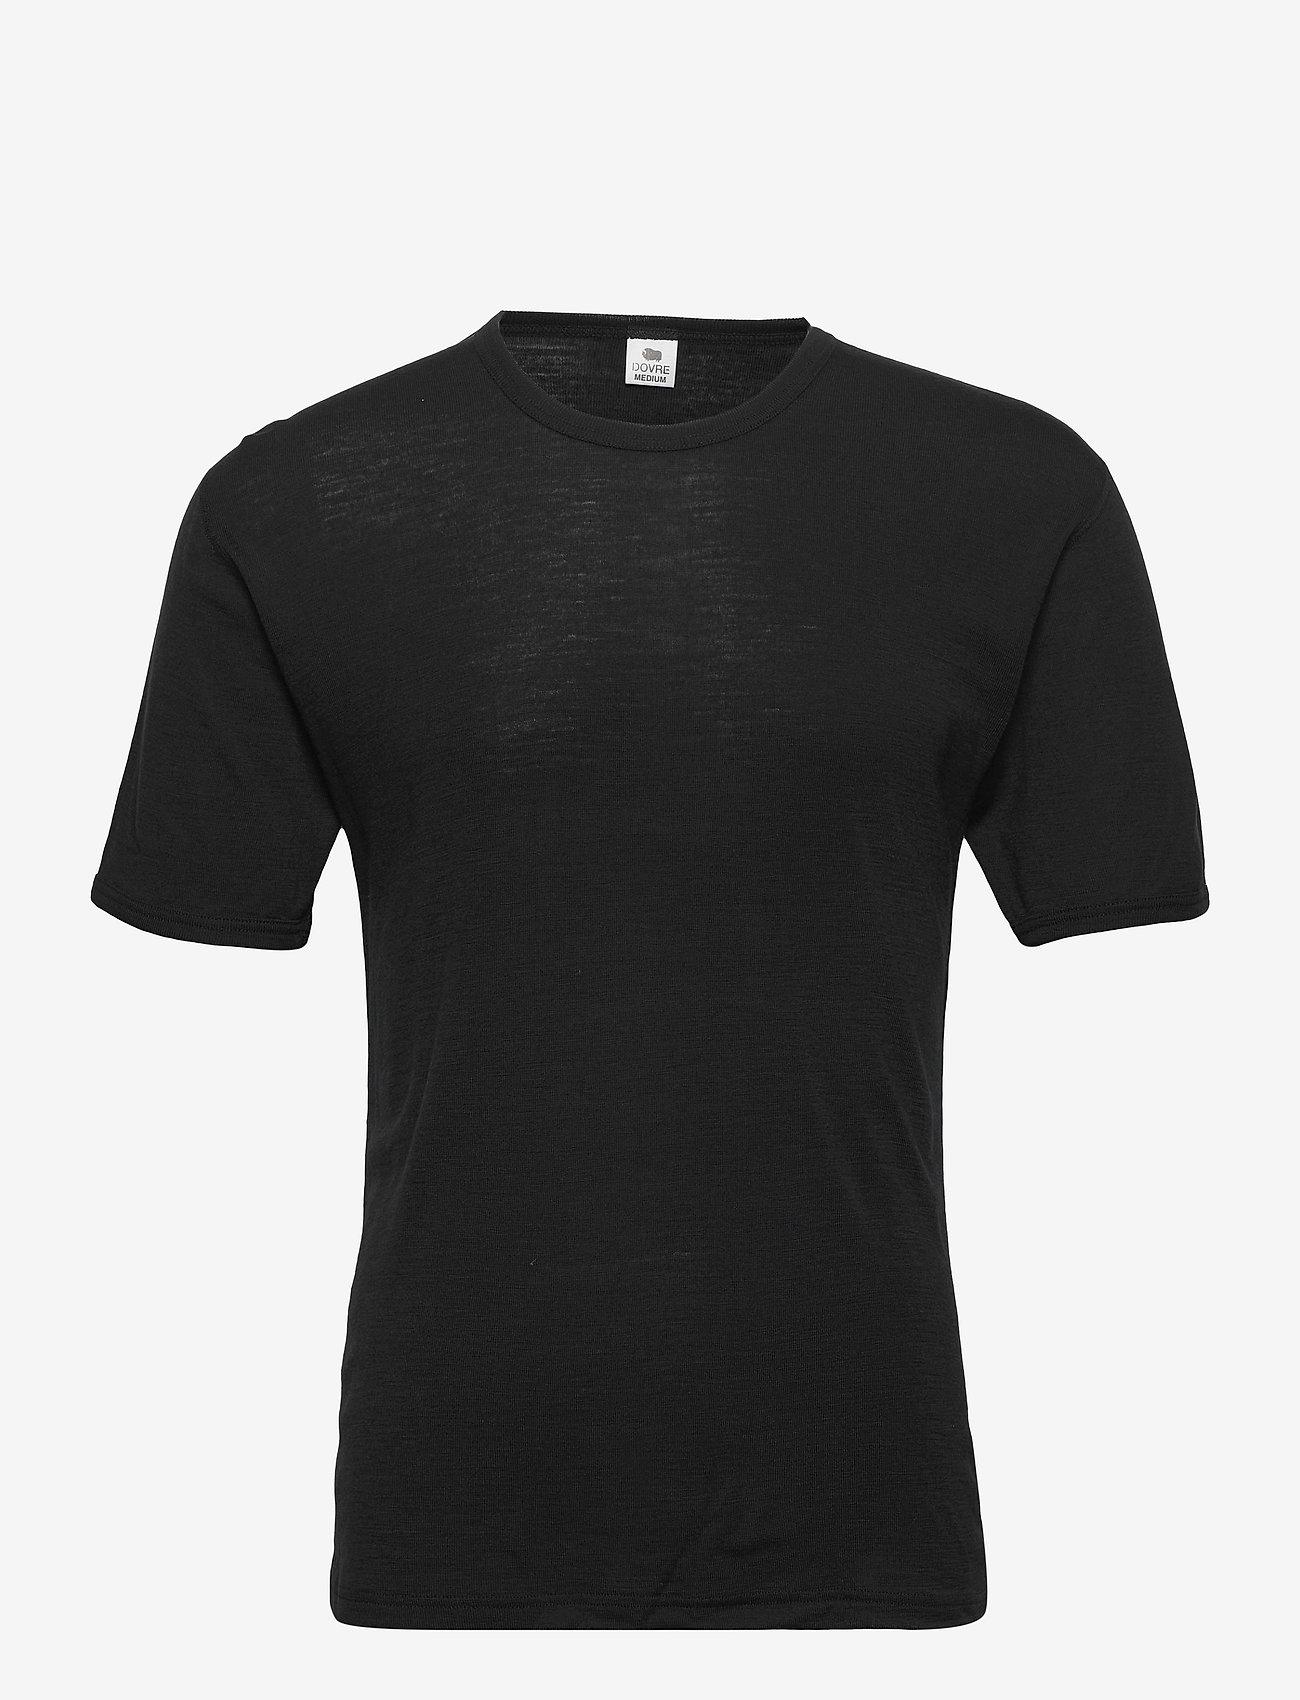 Dovre - T-shirts 1/4 ærme - t-krekli ar īsām piedurknēm - sort - 0